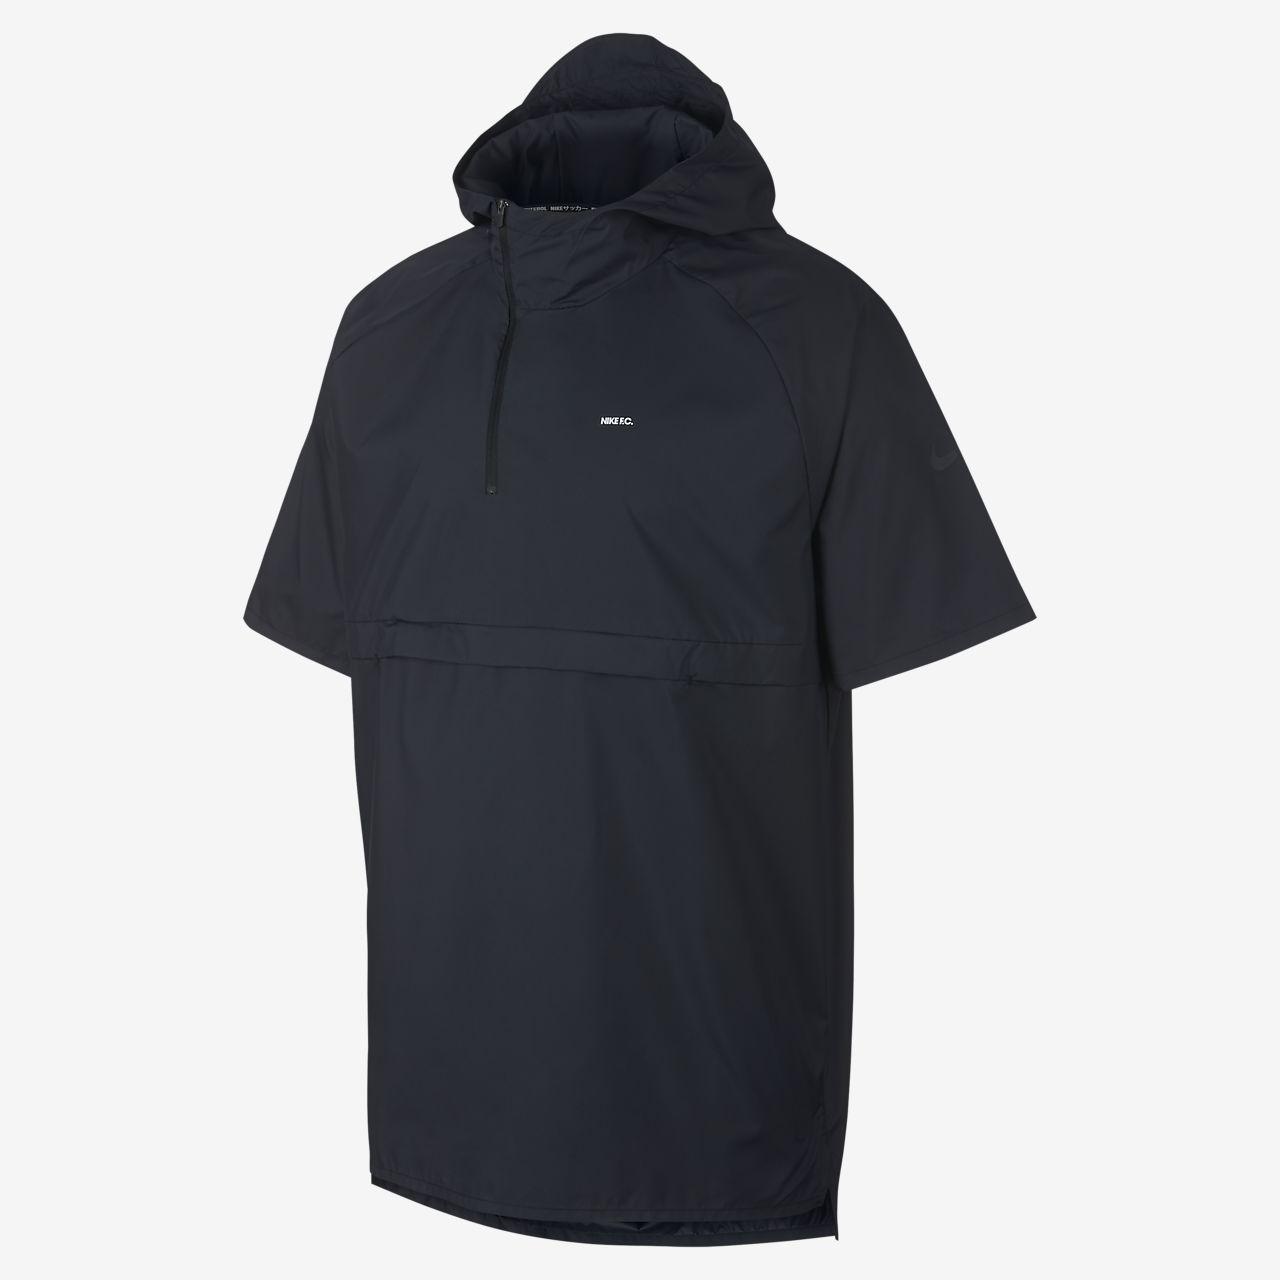 35c50727b889 Nike F.C. Men s Short-Sleeve Hooded Football Jacket. Nike.com AU